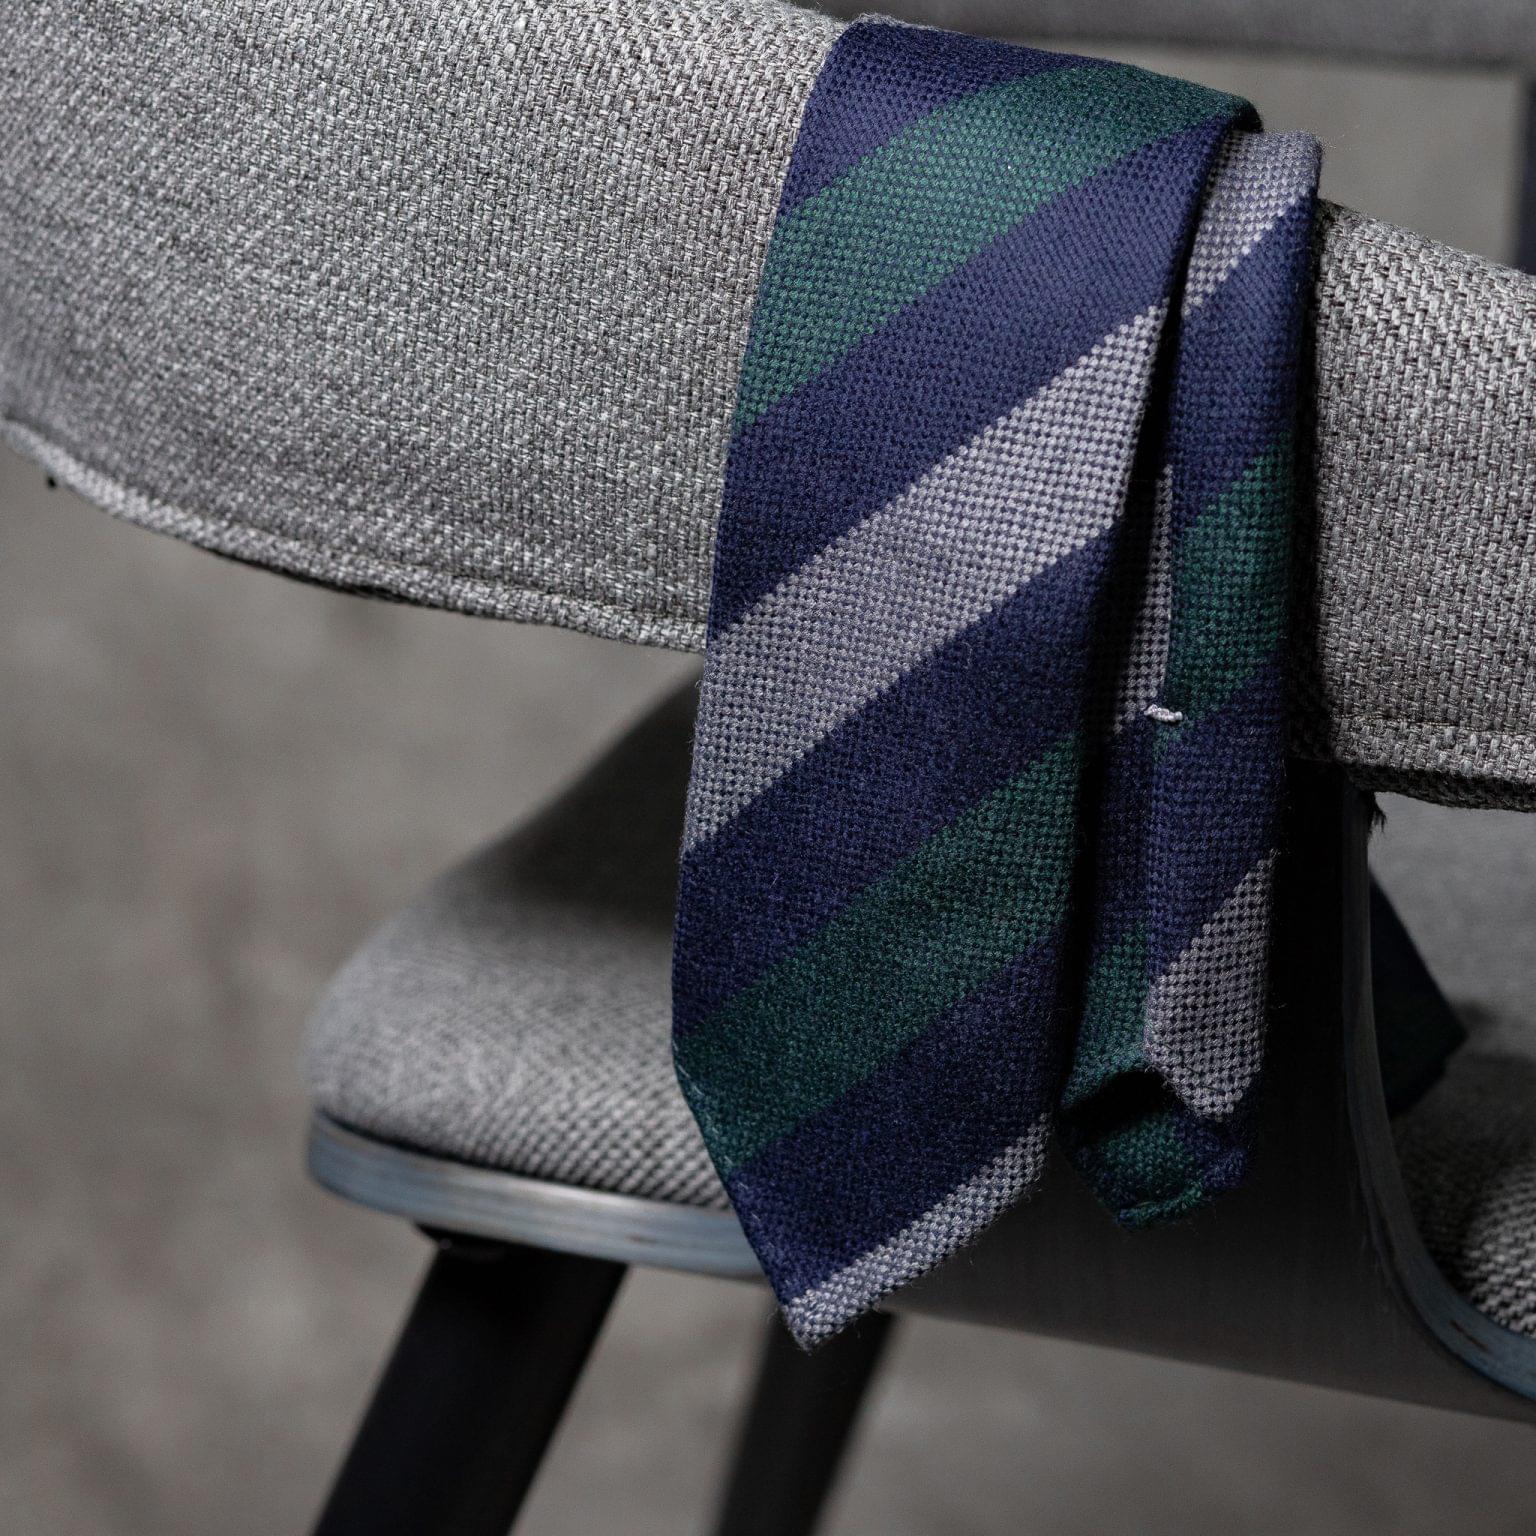 WOOL-LANA-0517-Tie-Initials-Corbata-Iniciales-The-Seelk-2